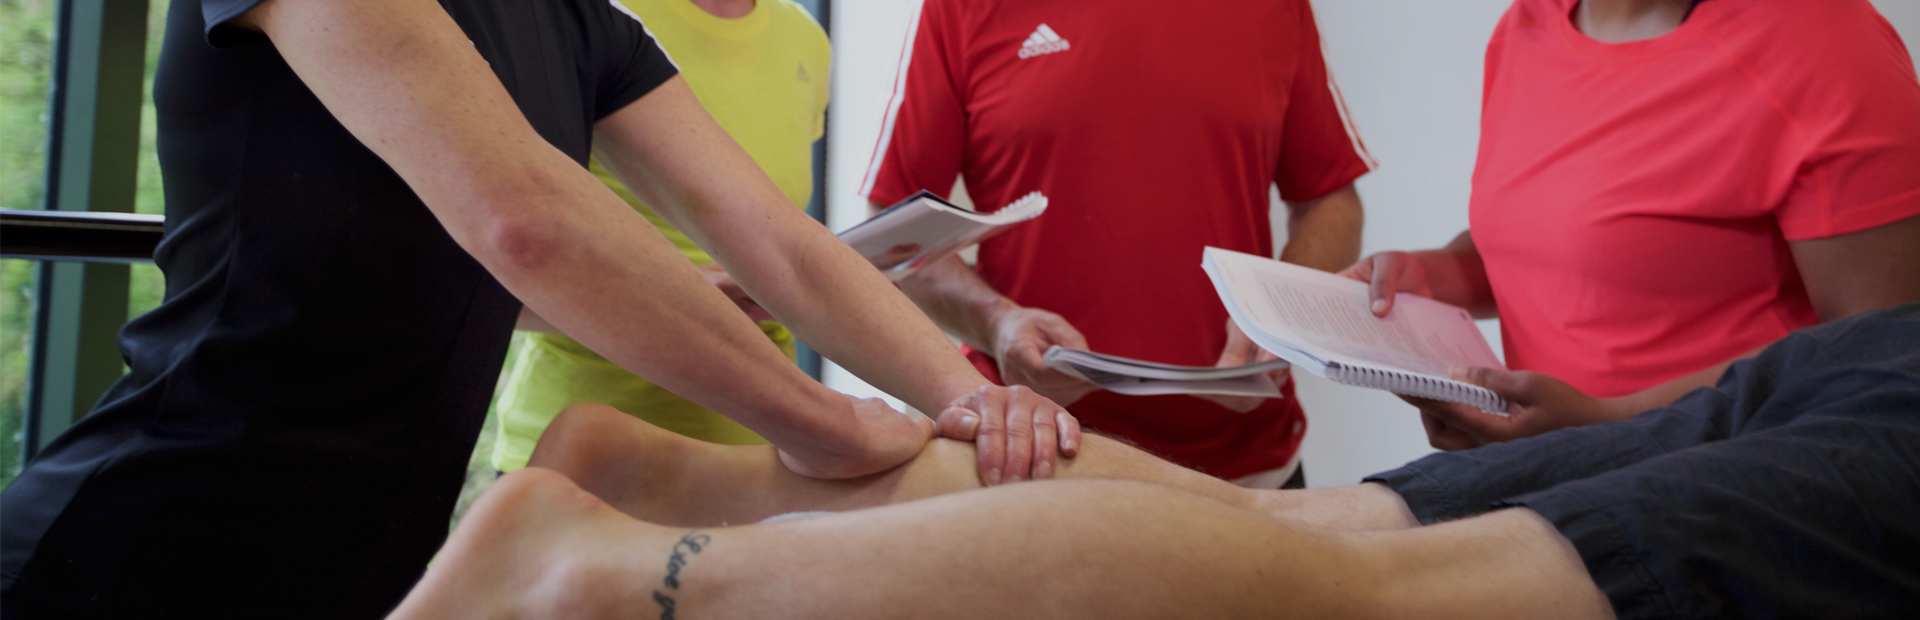 HFE's Level 4 sports massage course